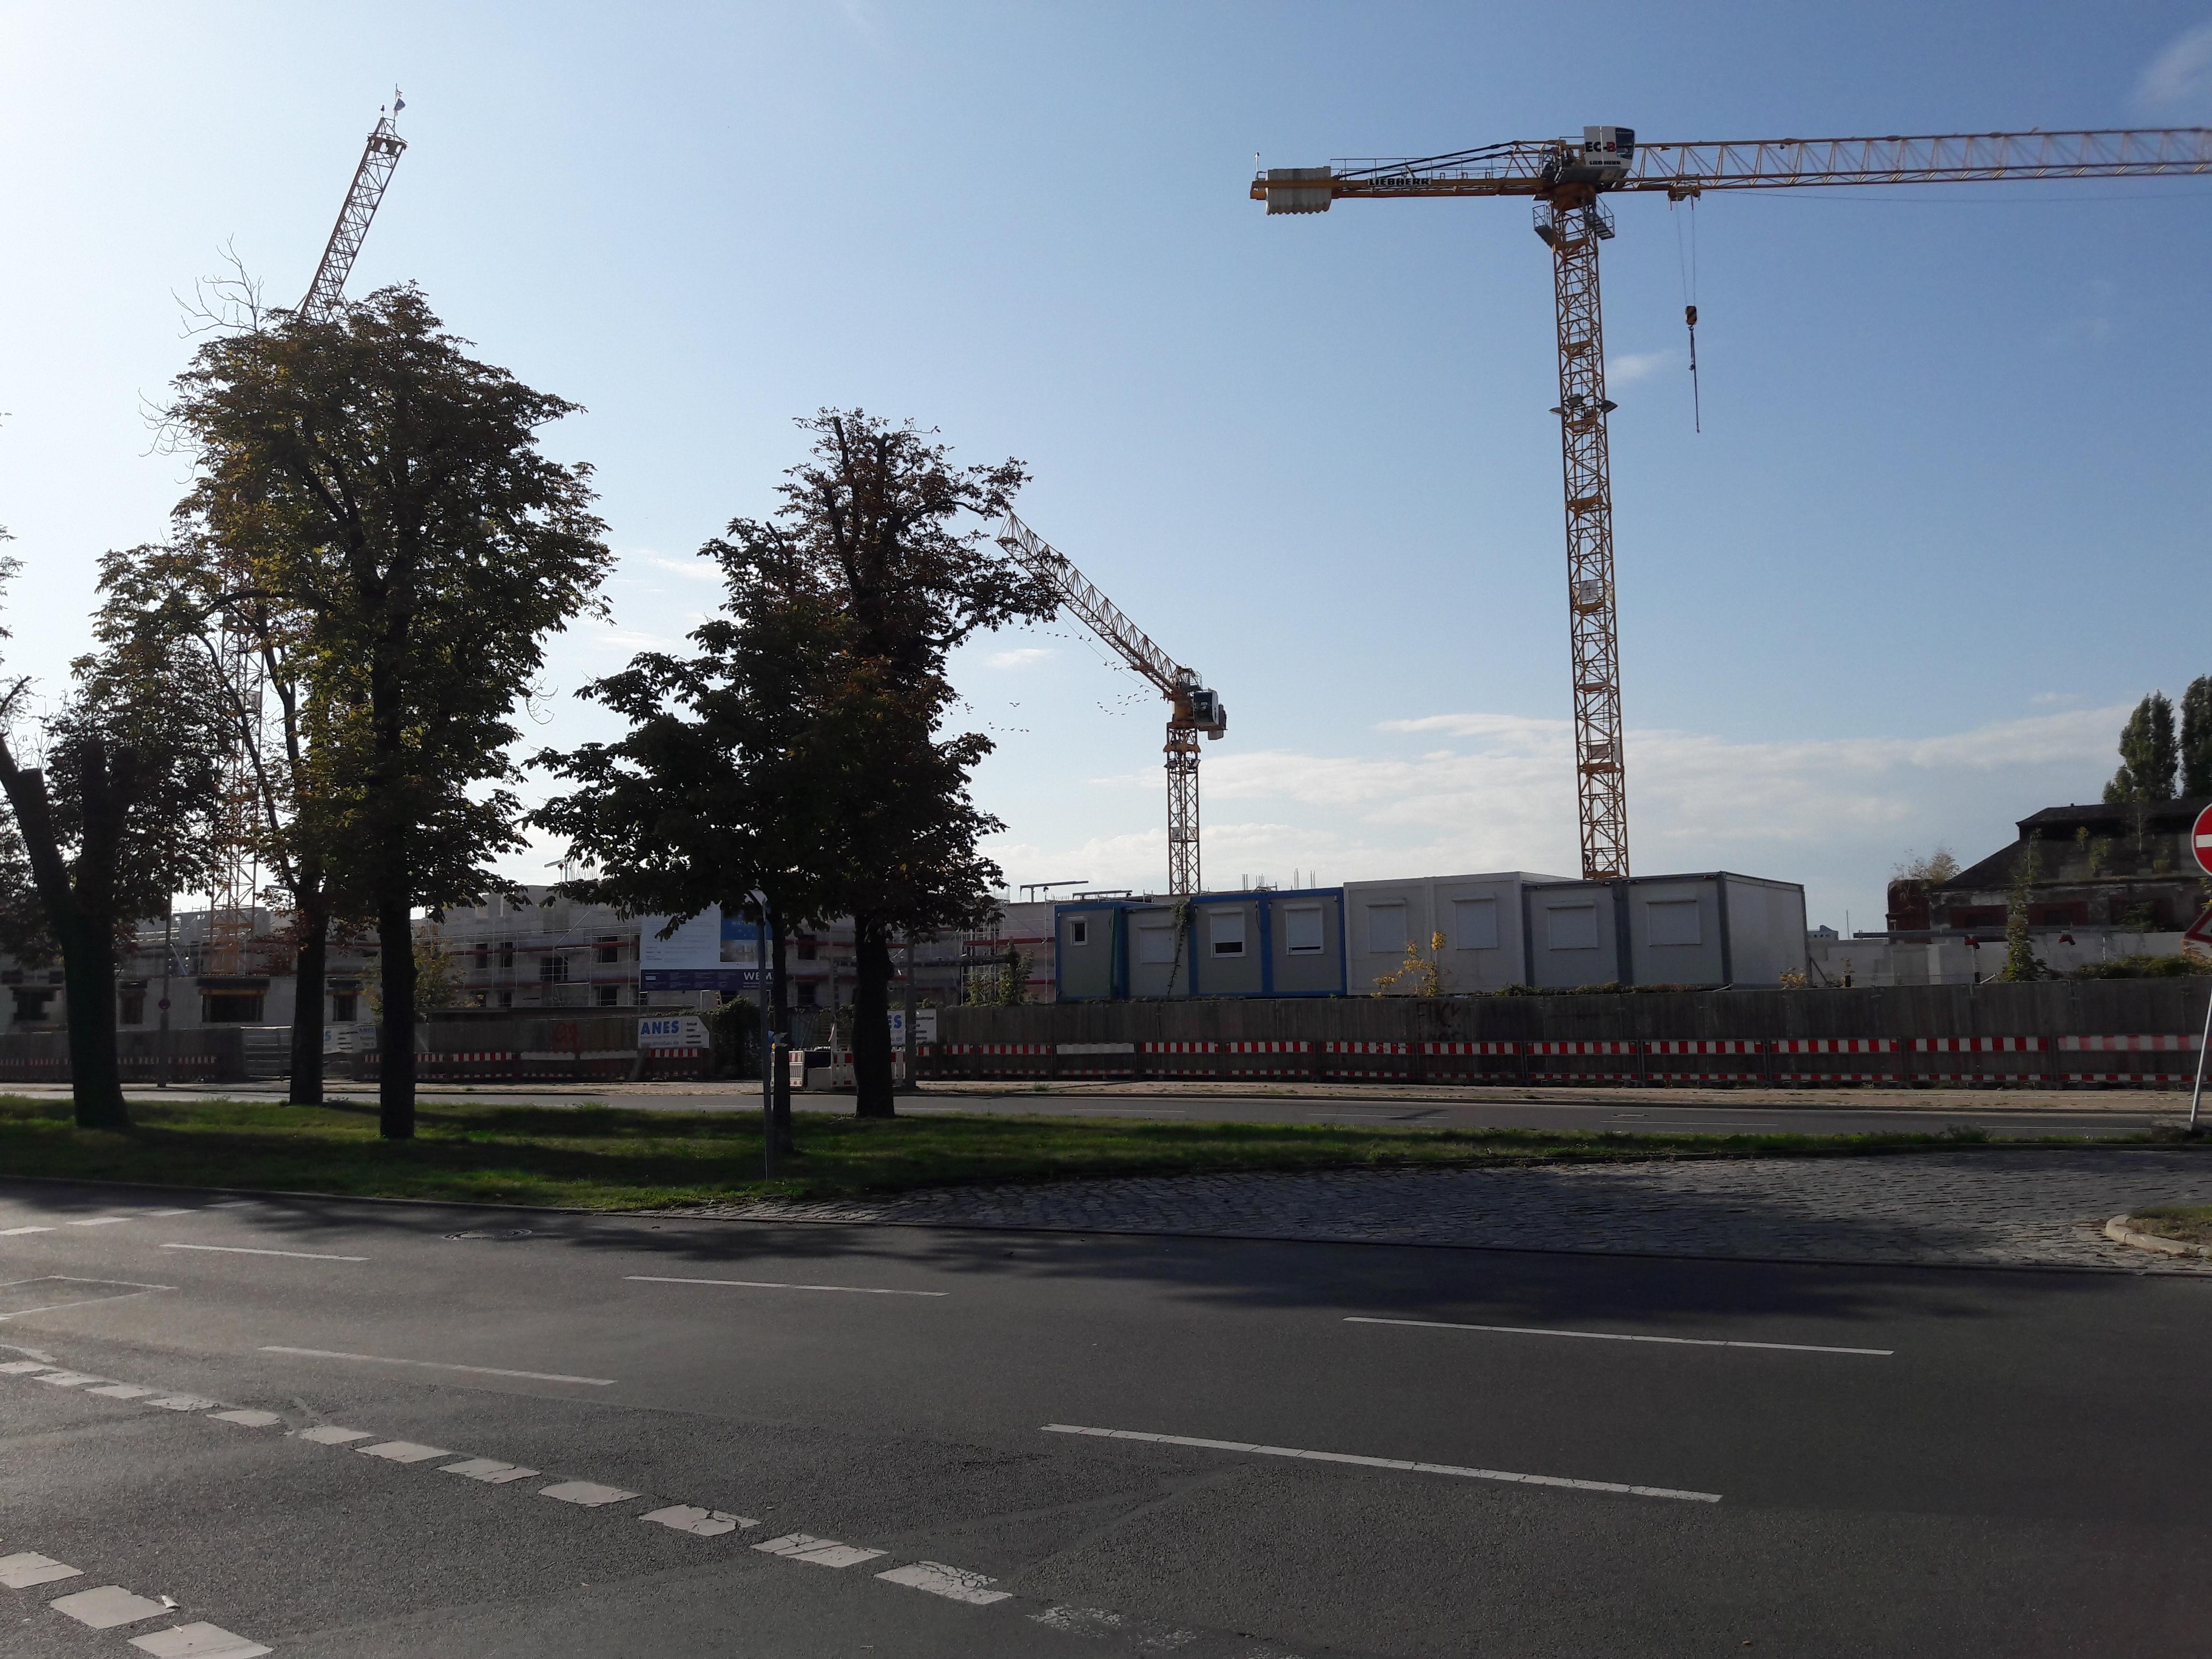 Oberhavel-Wasserstadt-Baustelle.jpg